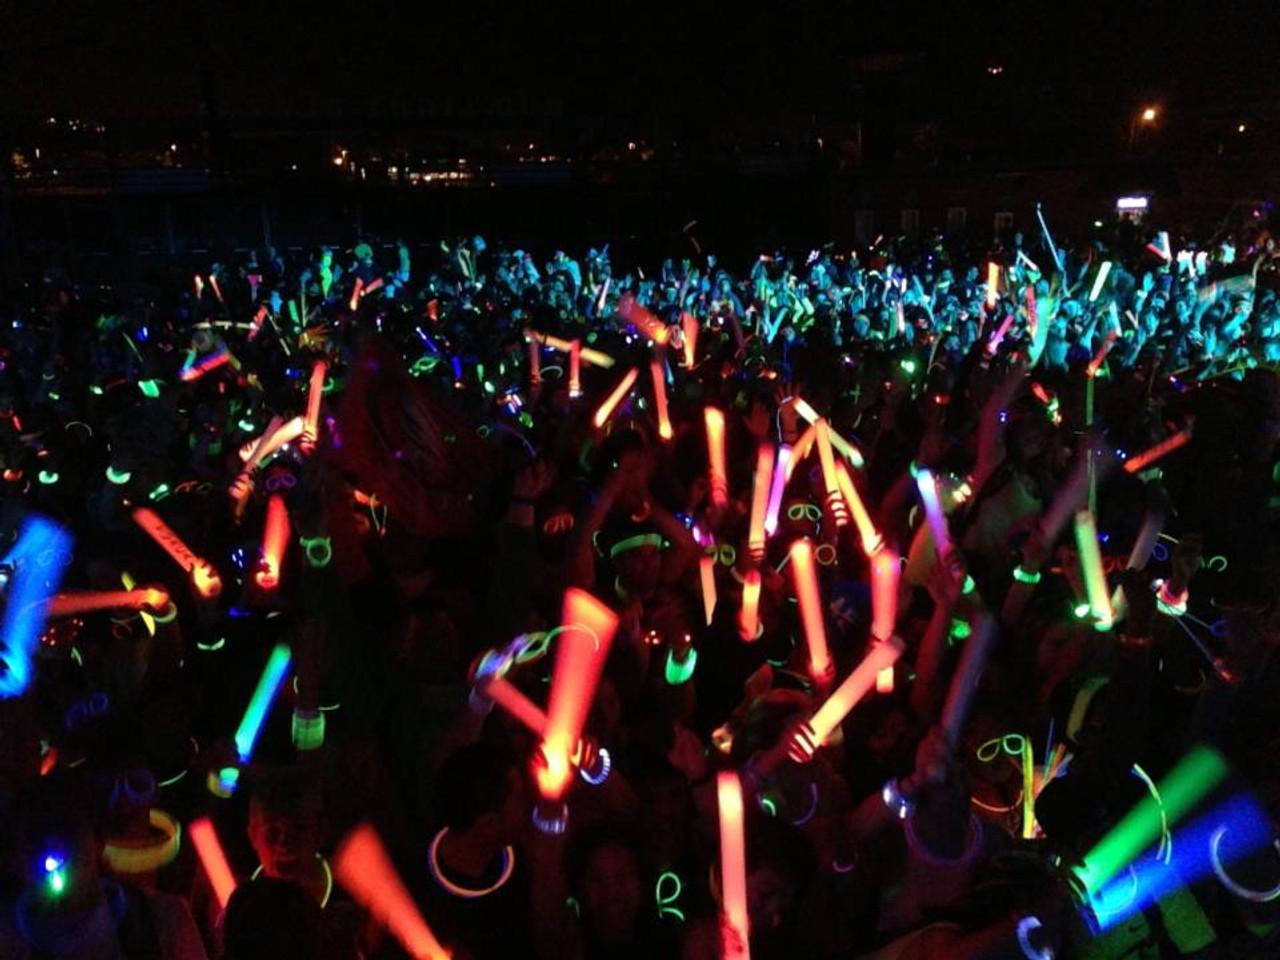 LED FOAM STICK, Led, Foam, Stick, Baton, Lumiton, Glow, Electronic, Light, Stix, Rave, EDM, Palito, Palo, UV, Illuminate, luminoso, luz, Electro, stic, FoamStick, LEDFOAMSTICK, LED , LED BATON, Custom LED Foam Stick, Customized, Personalized, EDM, Electro, House, Promo, Nightclub, Baton, Wand, Stix, Glow, Light up, Lit up, Electronic, Coachella, Grand Central, Foam Sticks, Foam Stix, Glow Sticks,